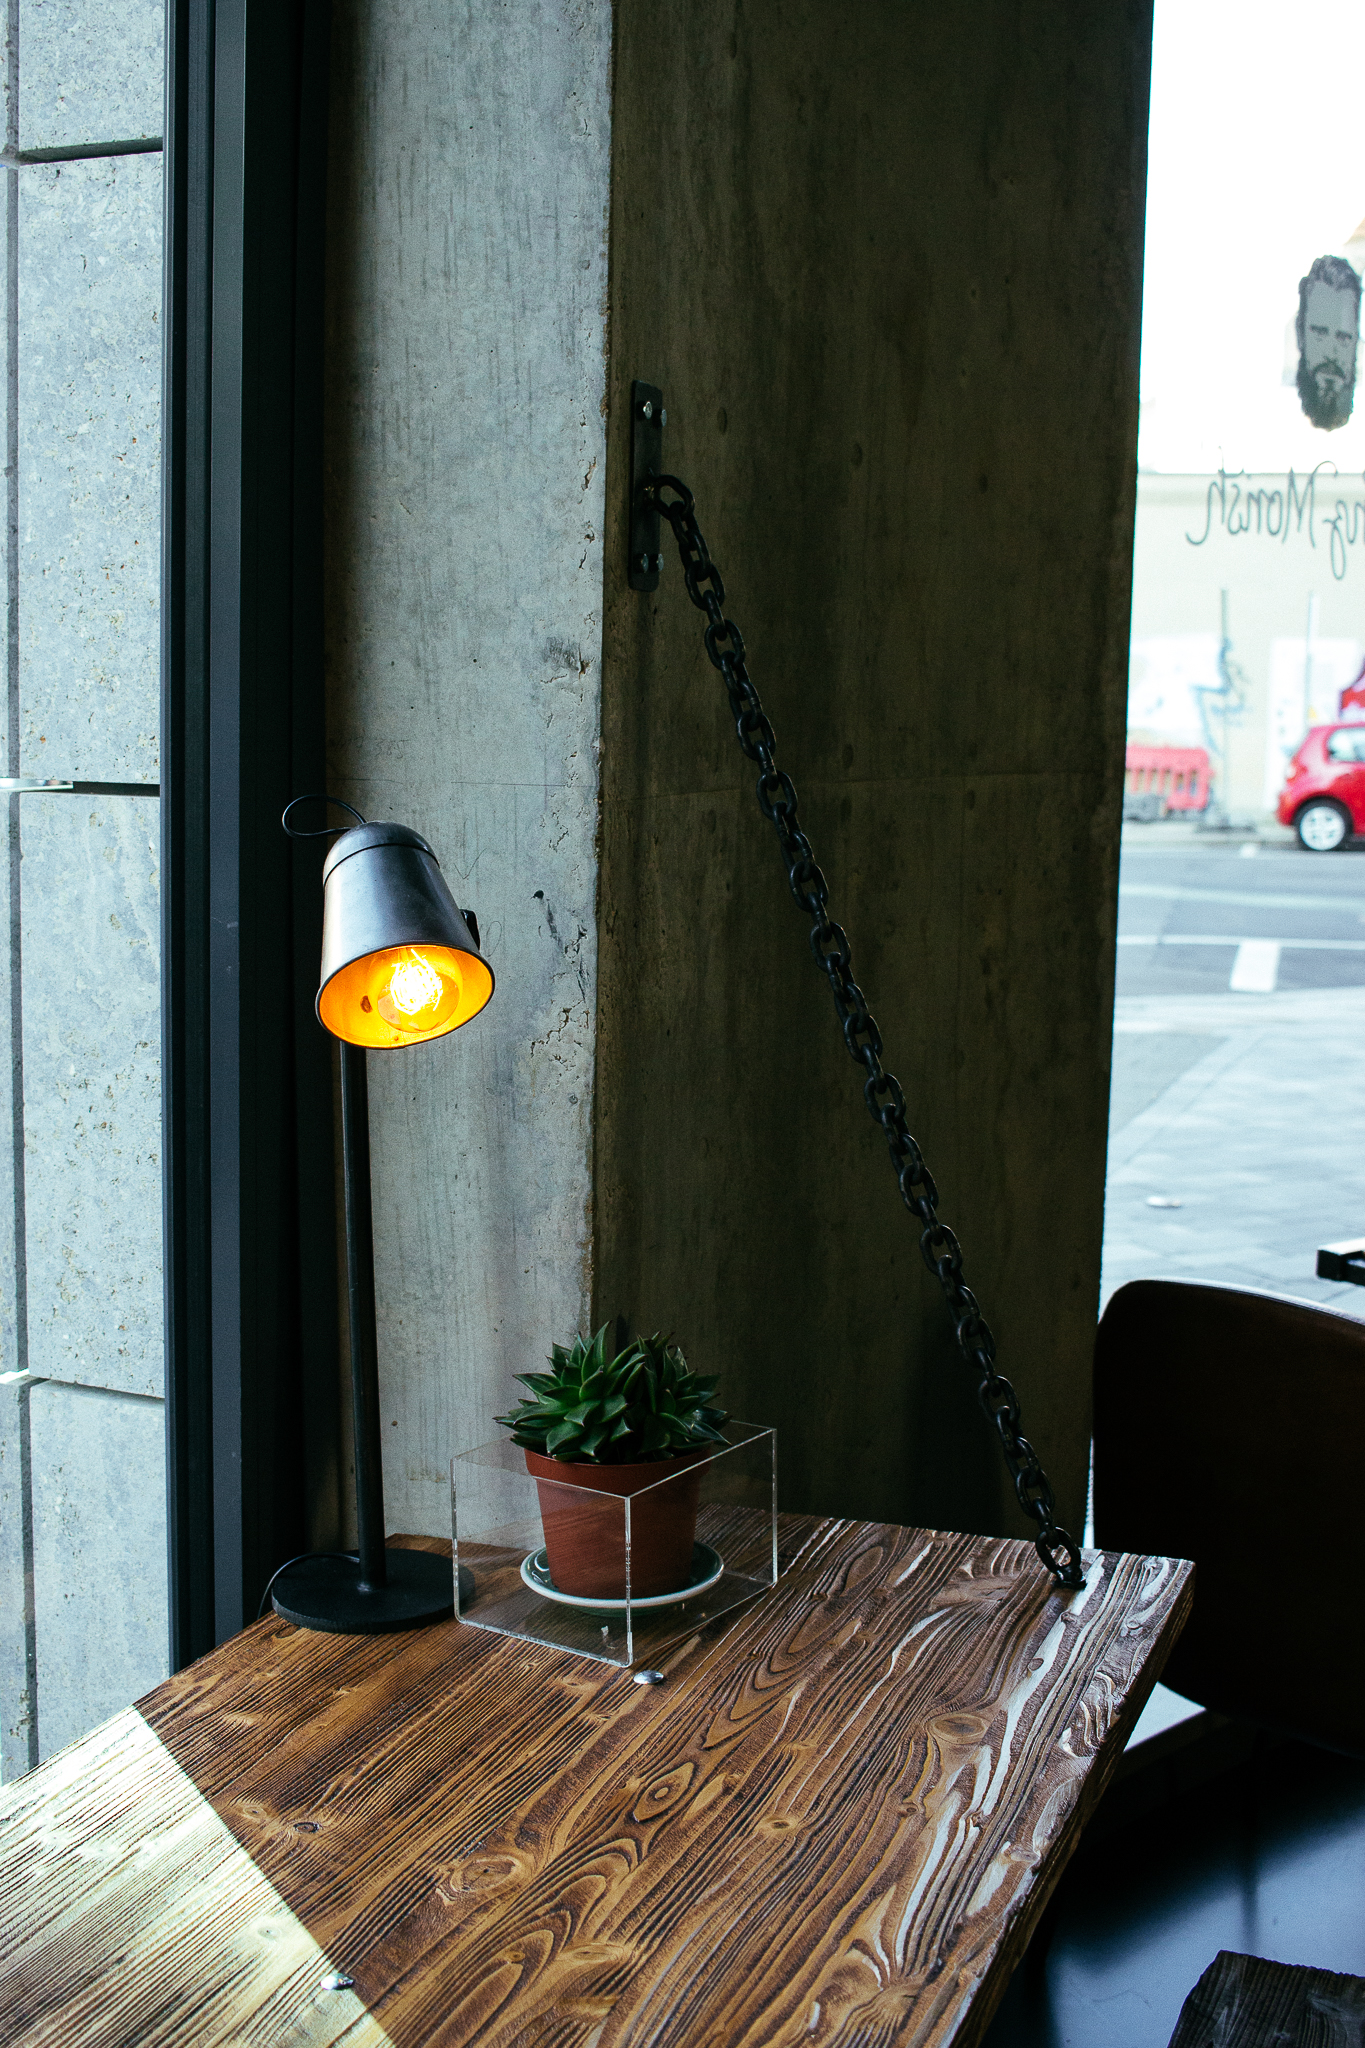 _MG_4512franz morish_kaffeehaus